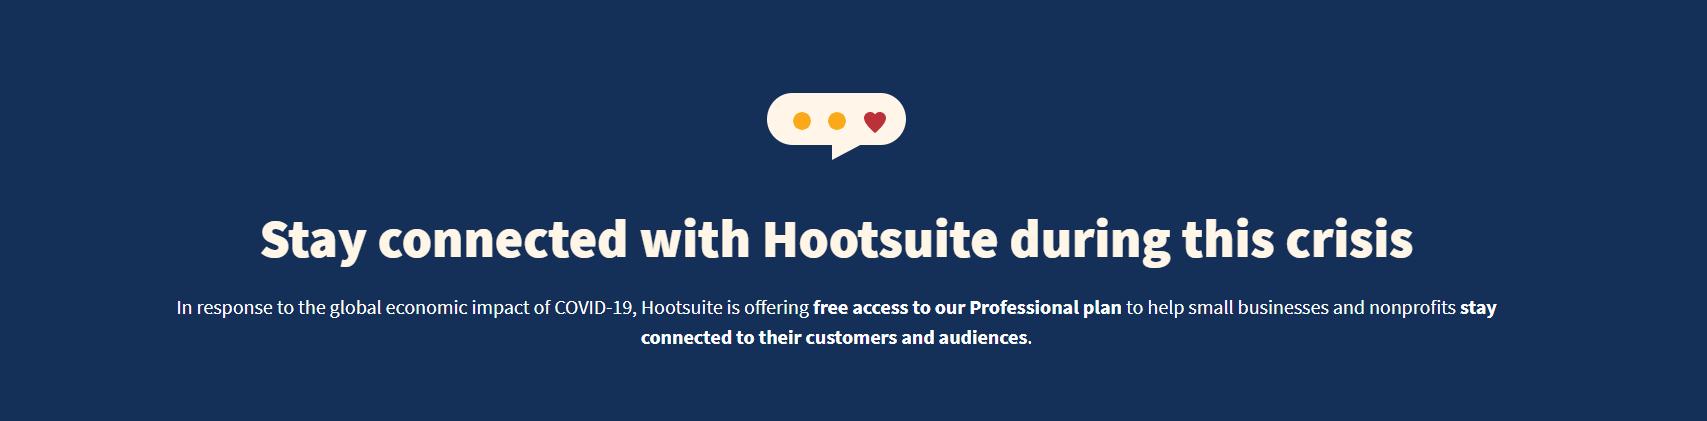 Hootsuite 社群整合發文